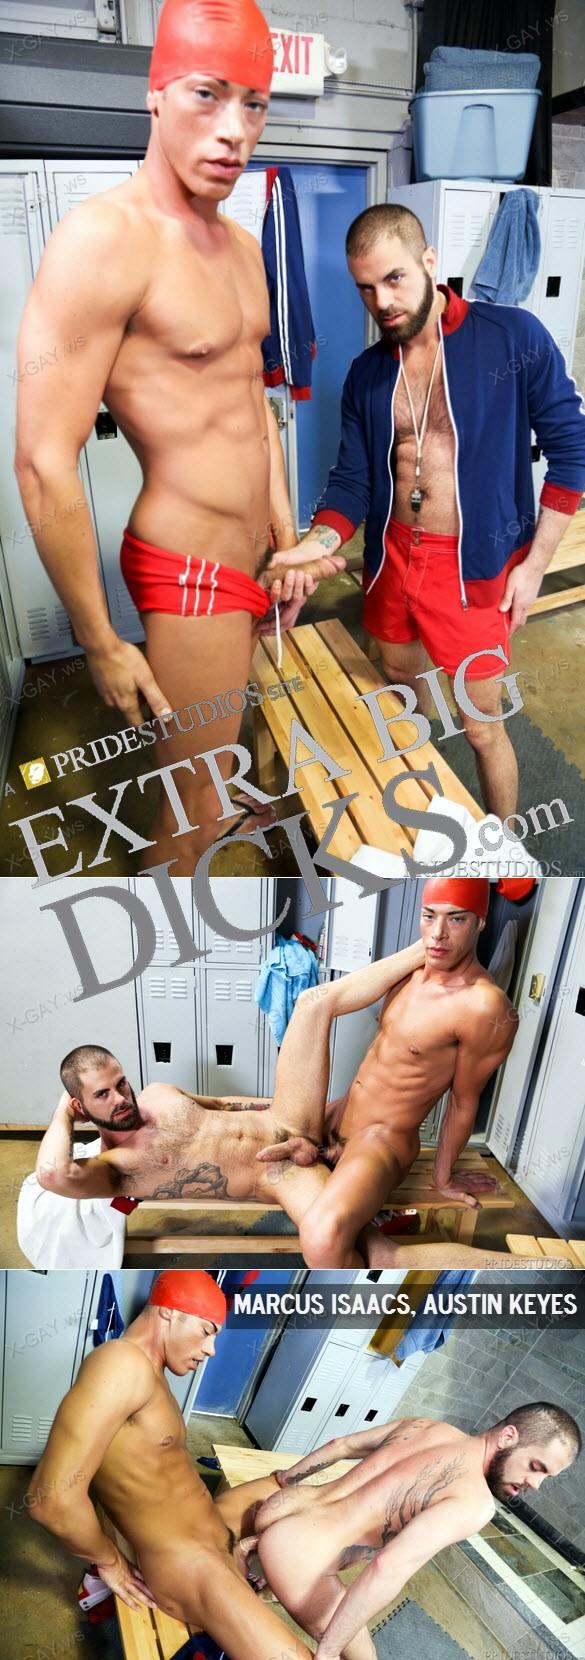 ExtraBigDicks – Marcus Isaacs & Austin Keyes